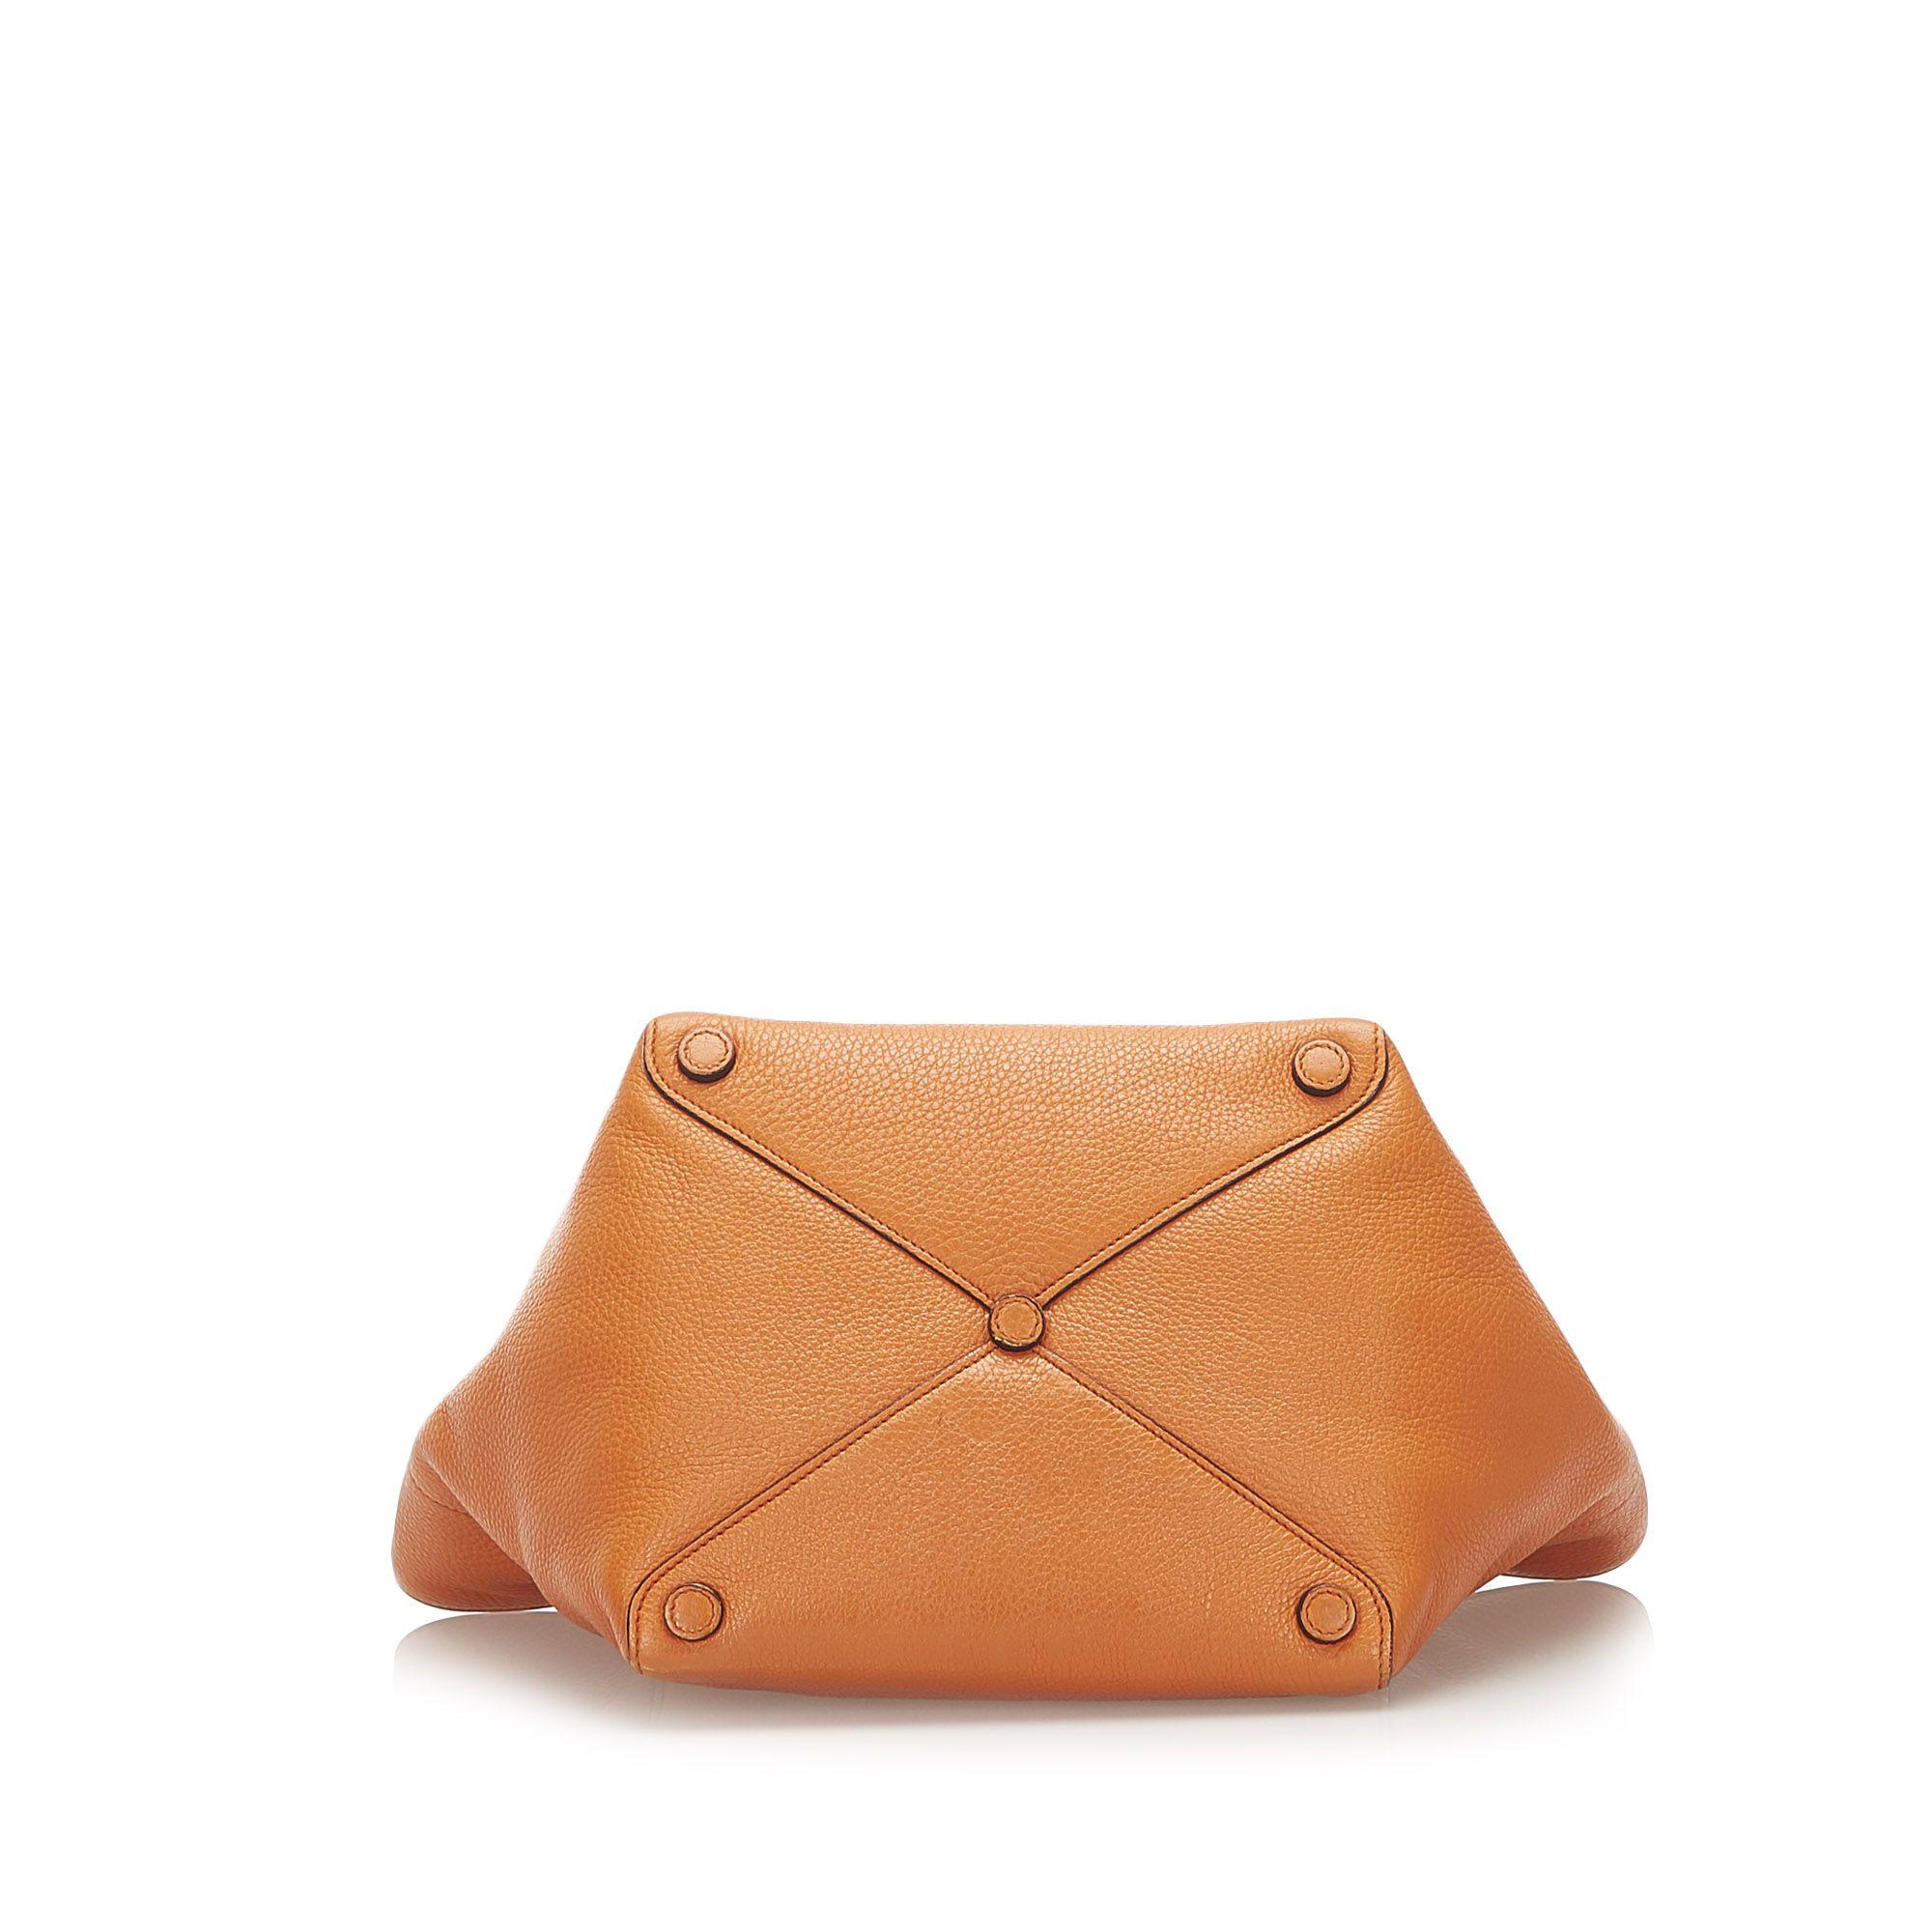 Vintage Prada Leather Tote Bag Orange